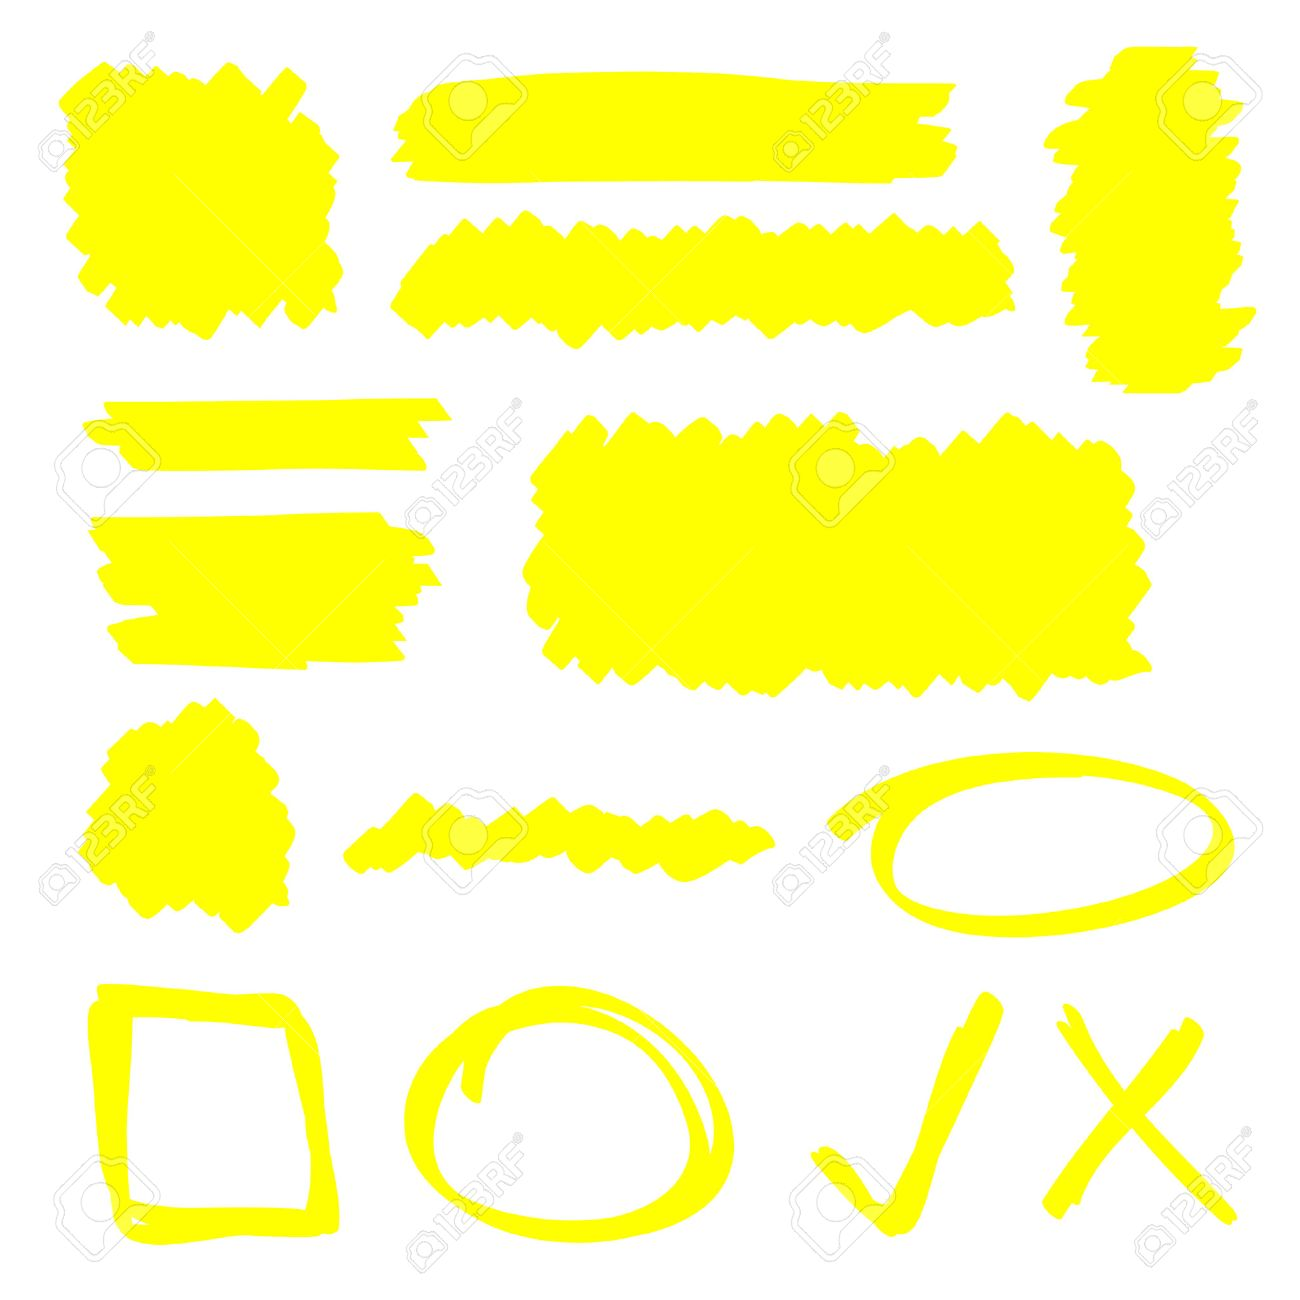 Yellow highlighter marker illustration set - 30150602